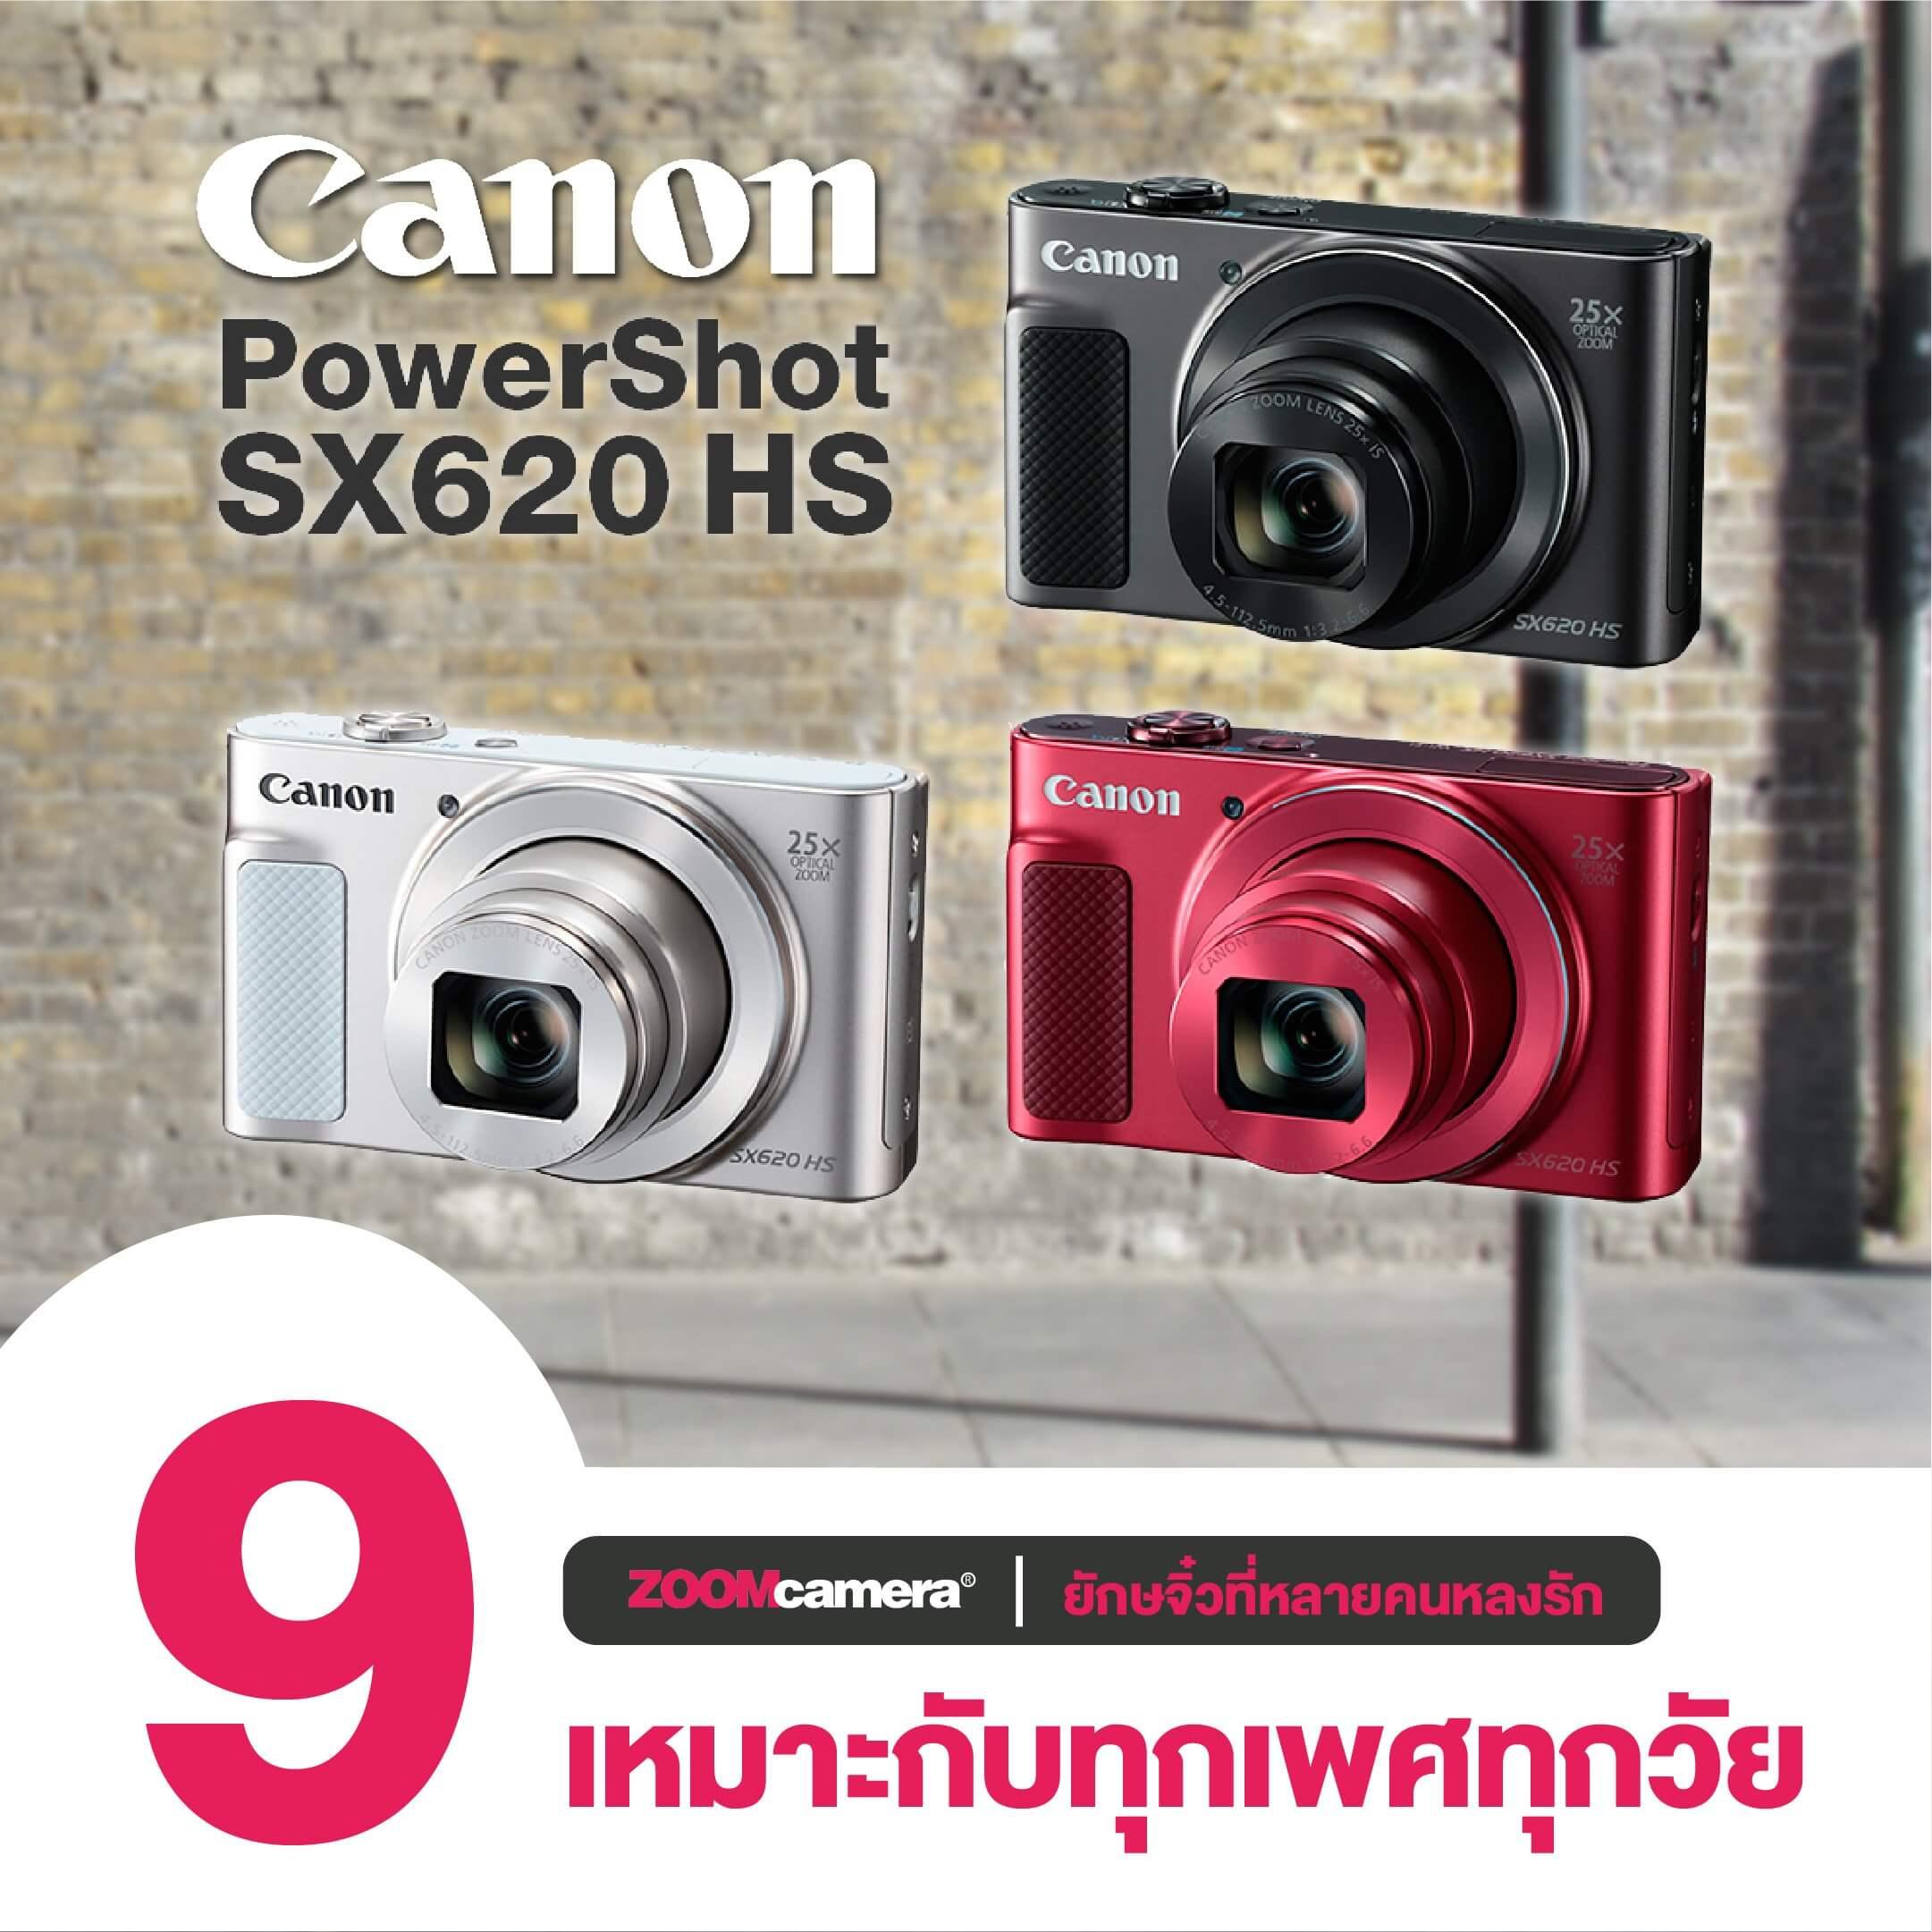 Canon Power shot SX620 HS ยักษ์จิ๋วที่หลายคนหลงรัก